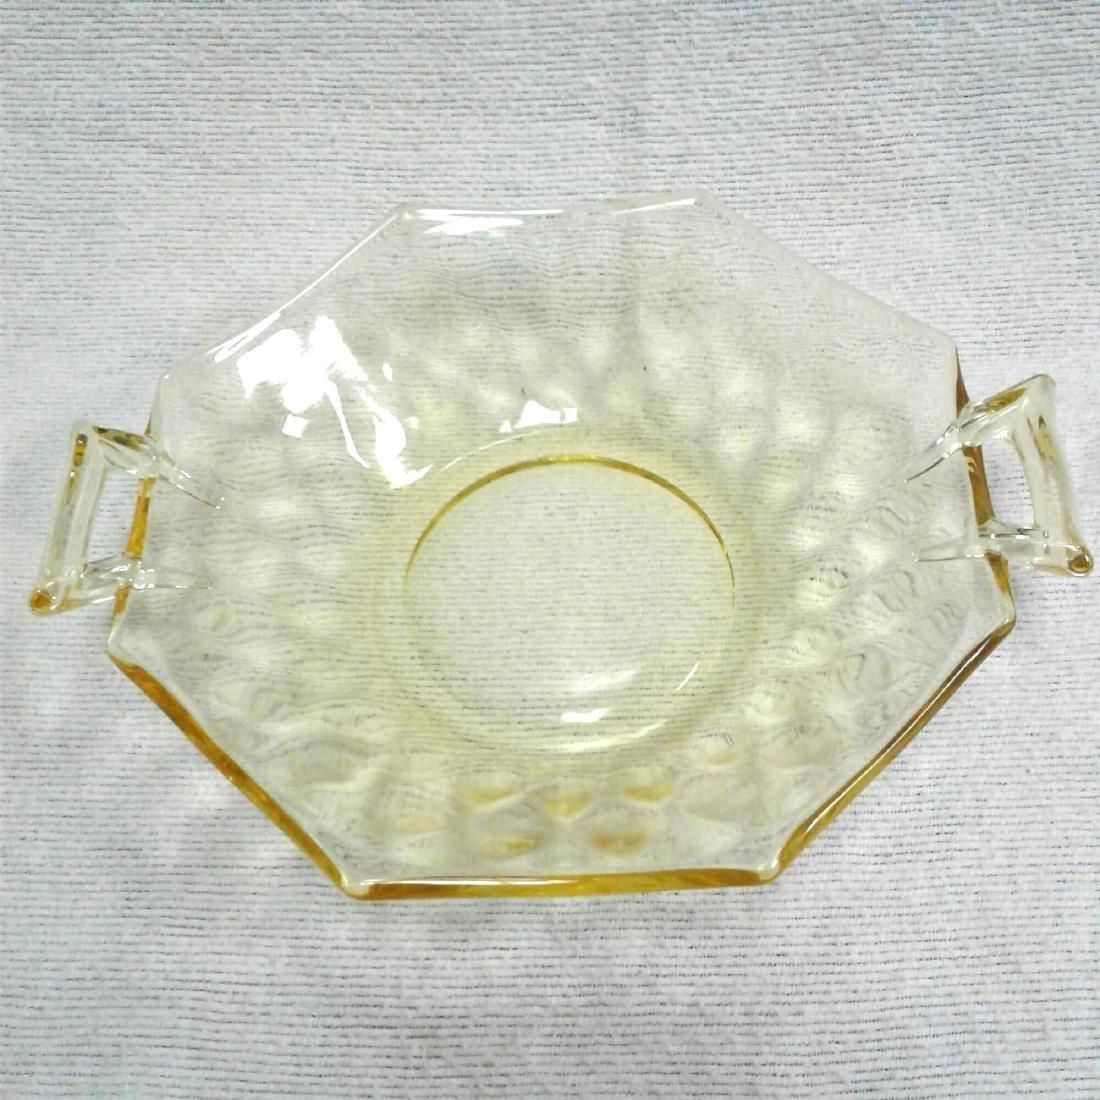 Amber Glass Candy Dish